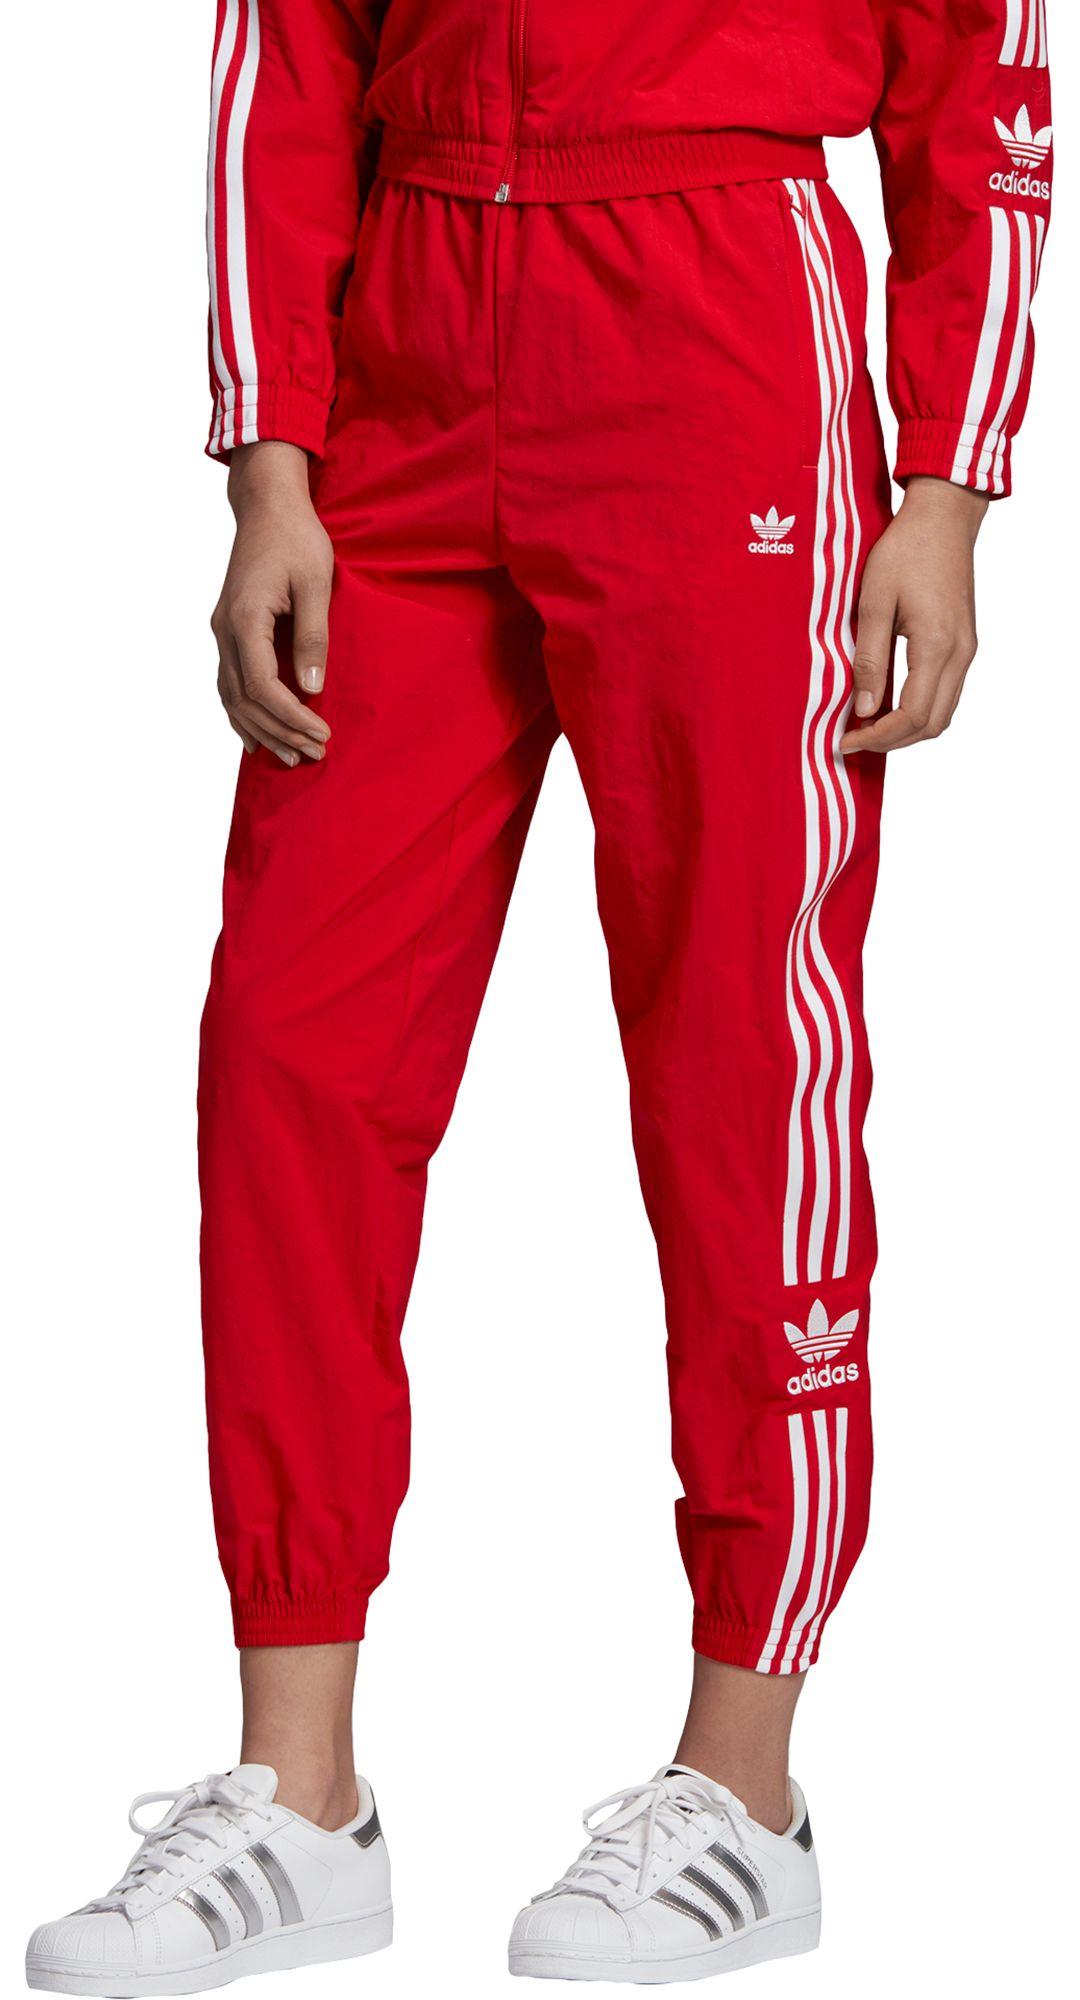 ff1bf252 adidas Originals Women's Lock Up Track Pants